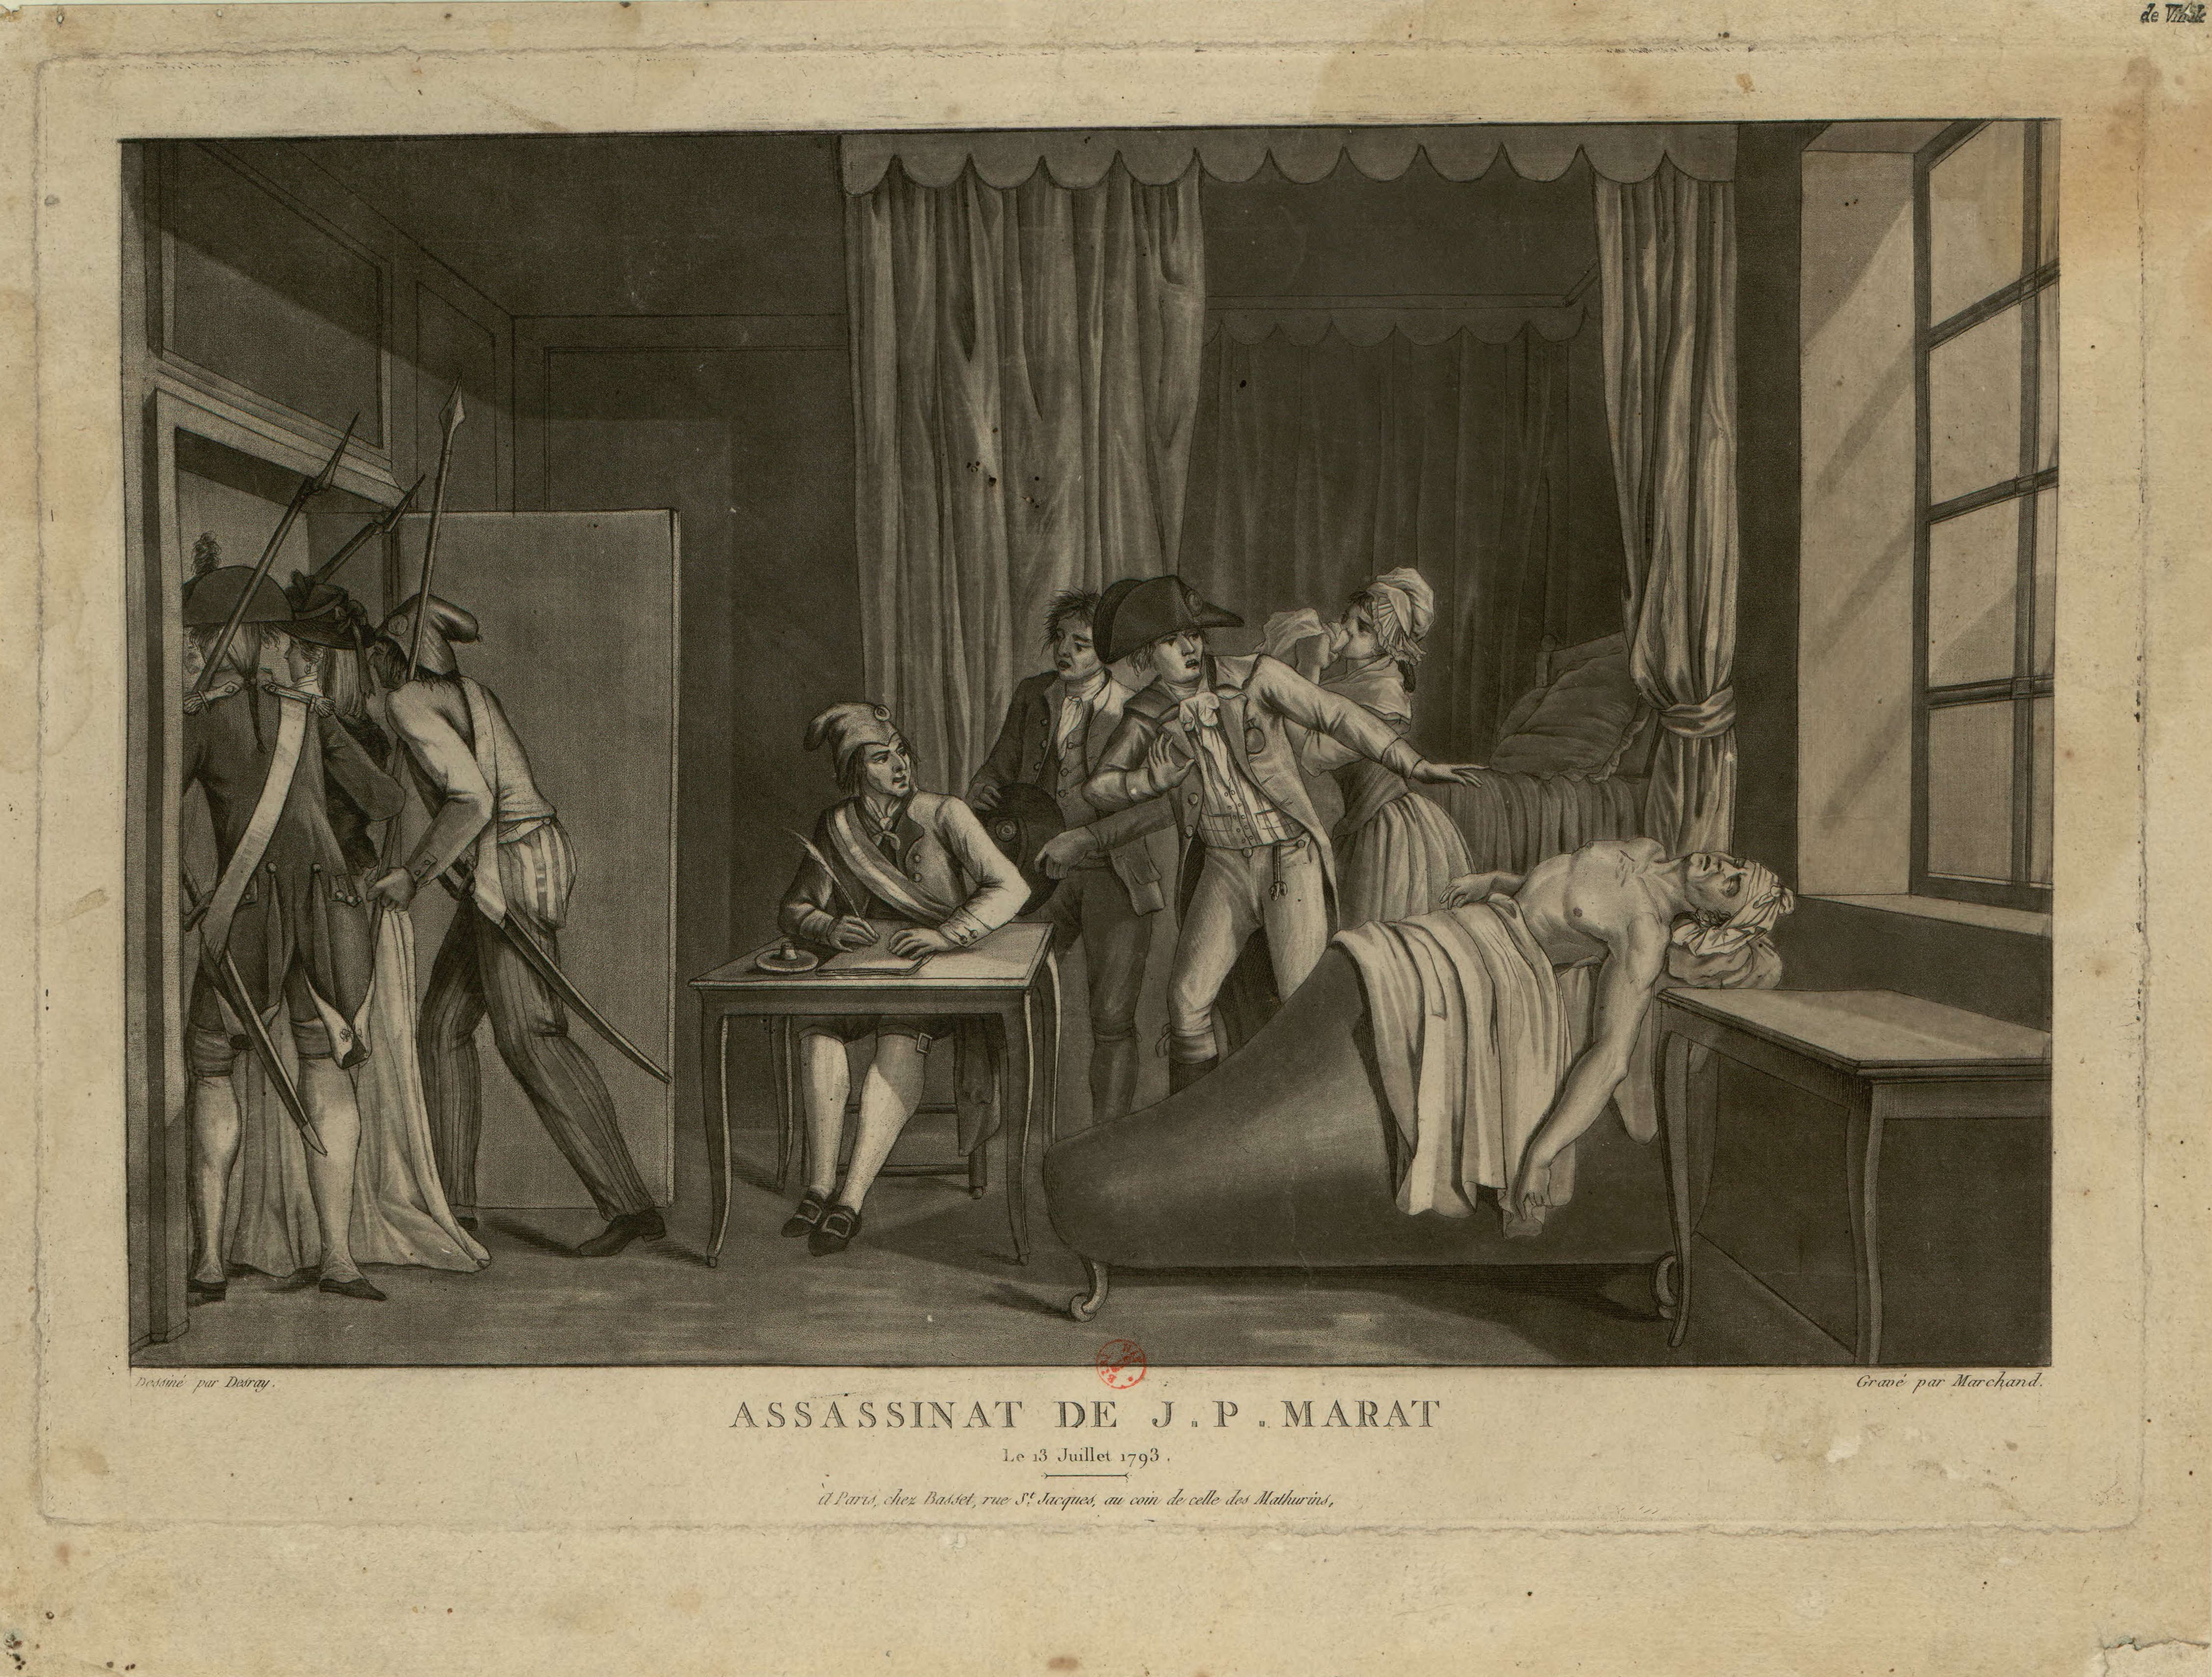 Engraving of death of Marat